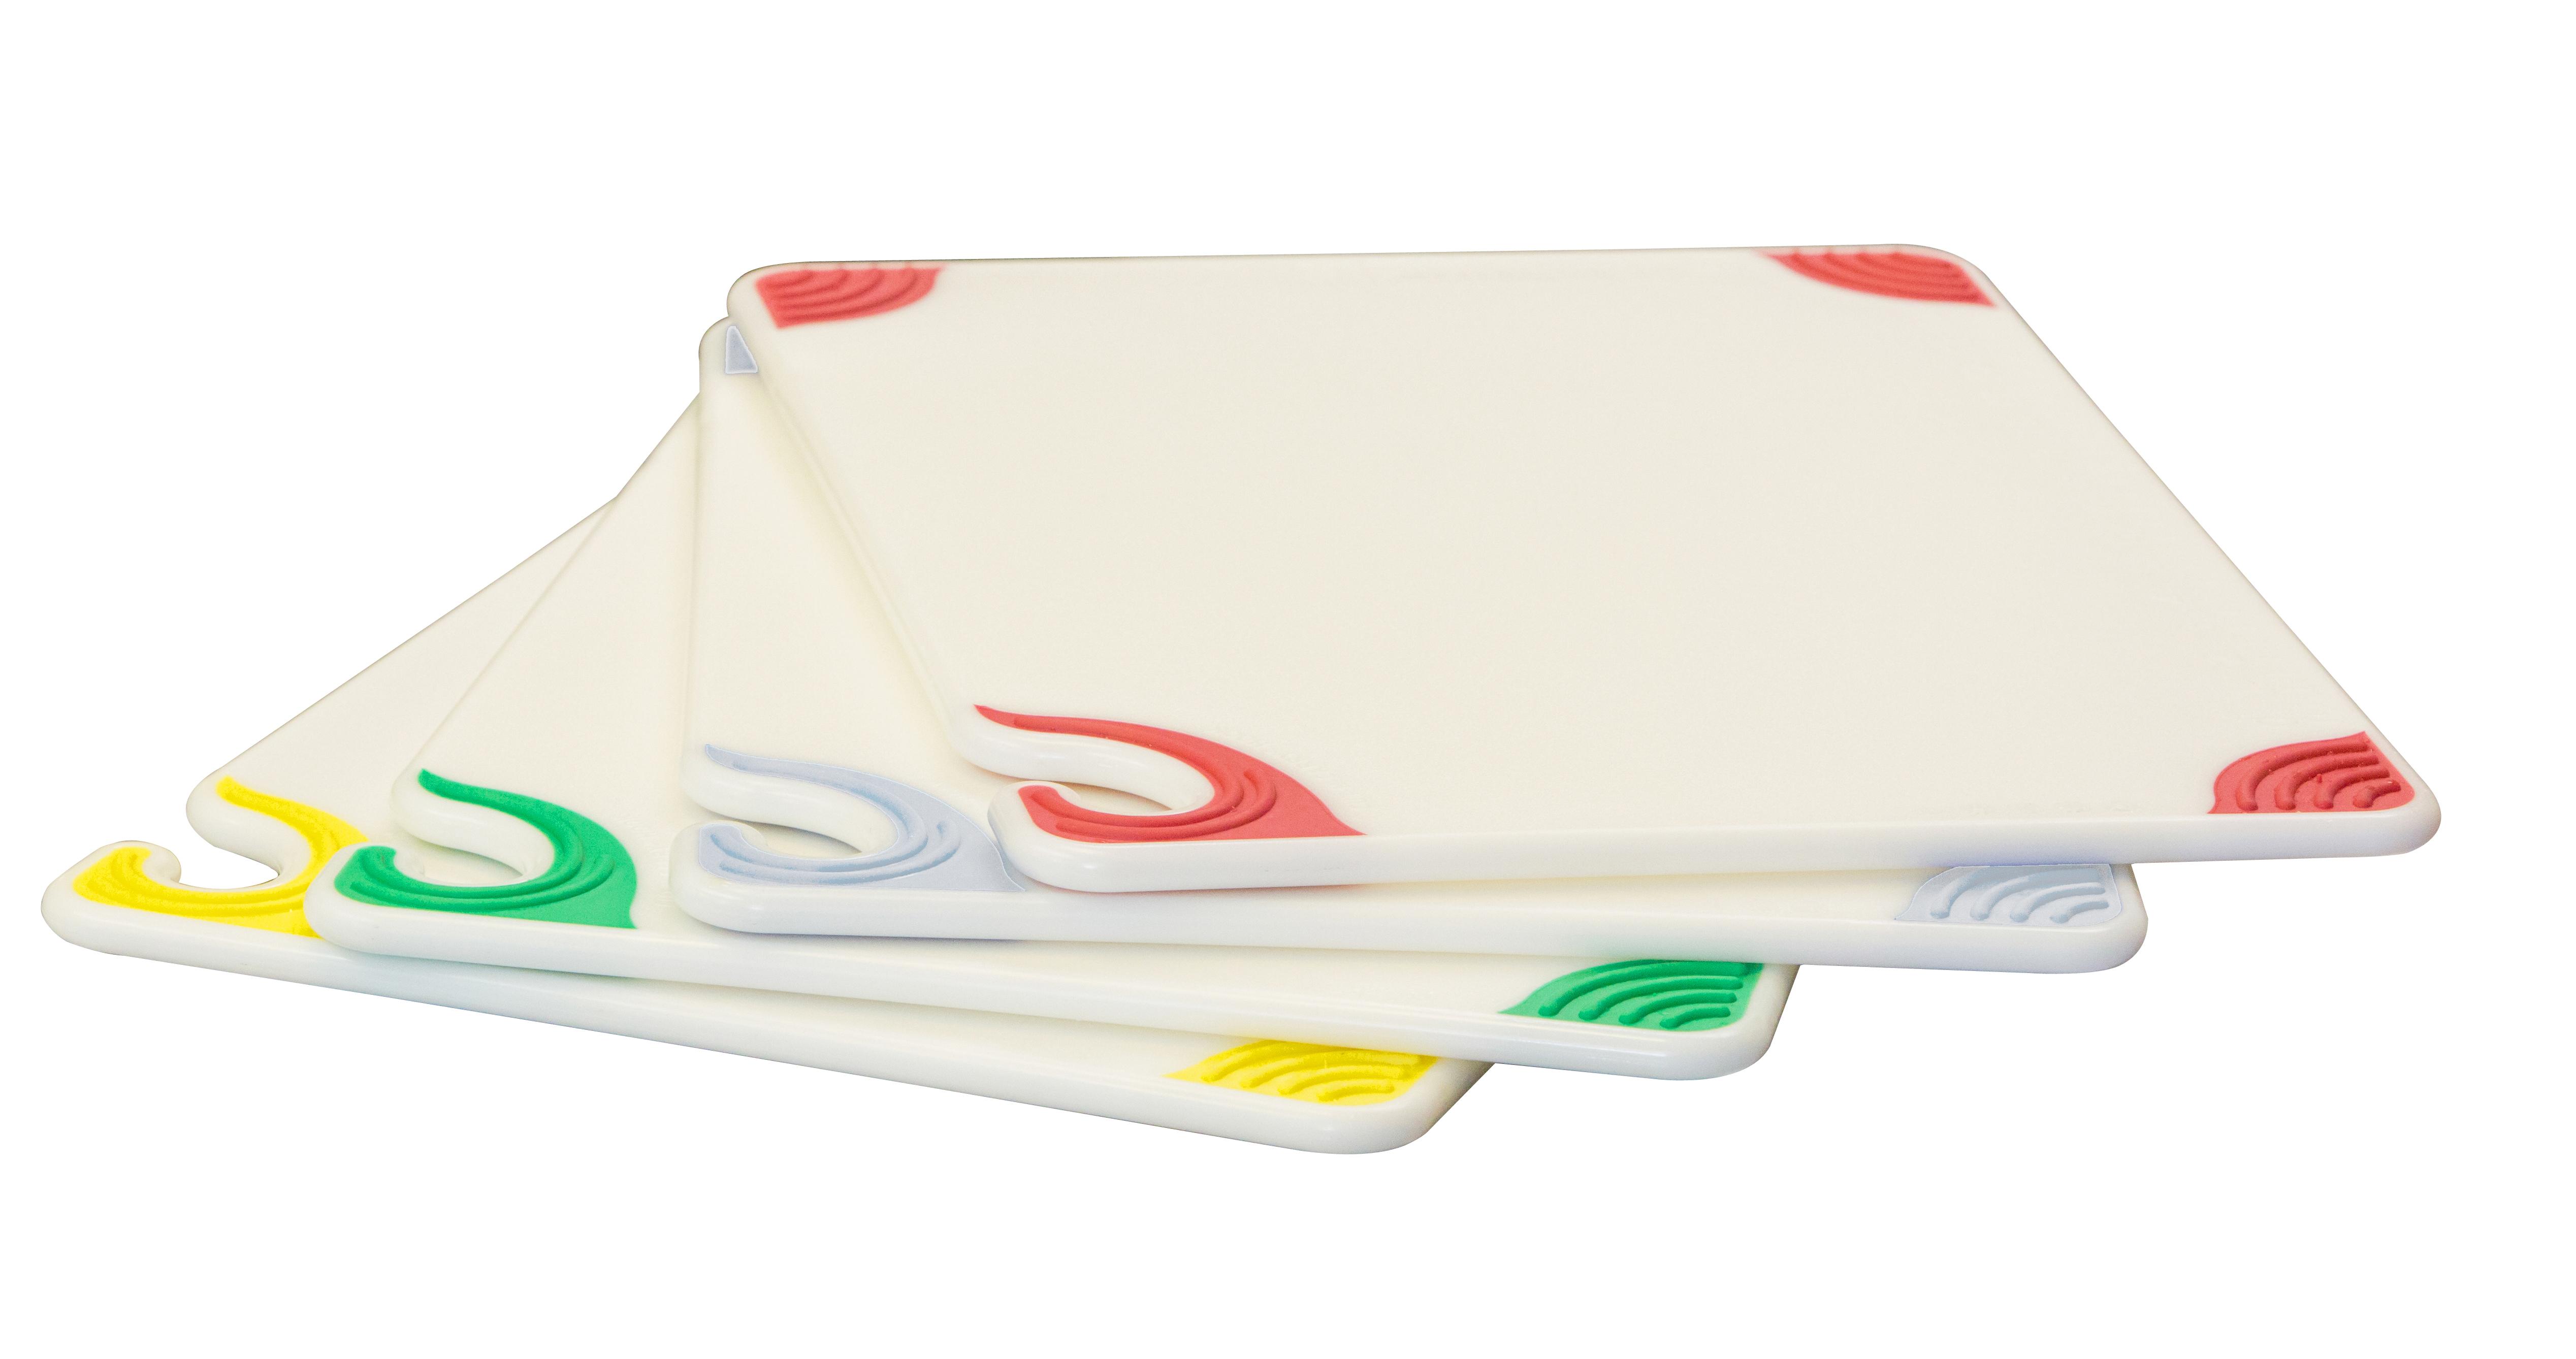 Saf-T-Grip 4 Board System